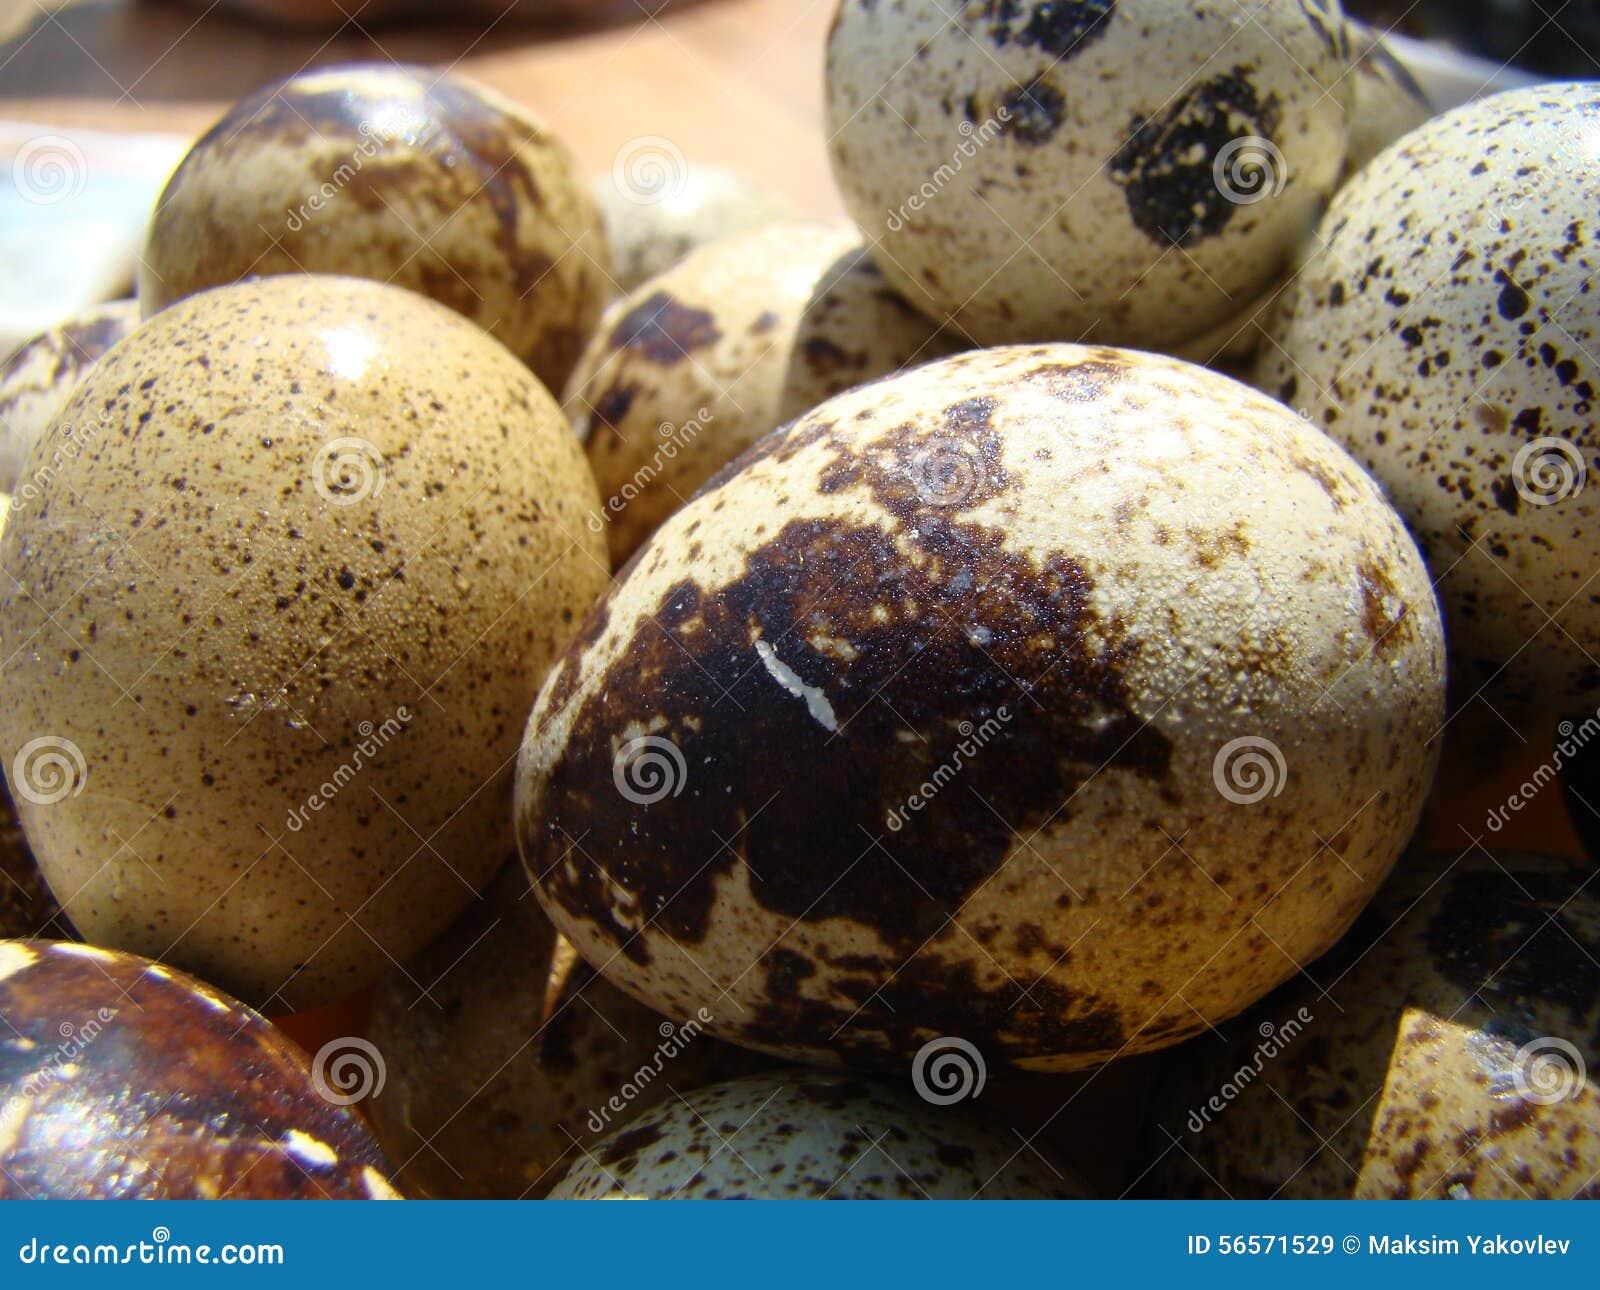 Download σαν αυγά ανασκόπησης πολλές νησοπέρδικες Στοκ Εικόνα - εικόνα από χρώμα, σιτηρέσιο: 56571529